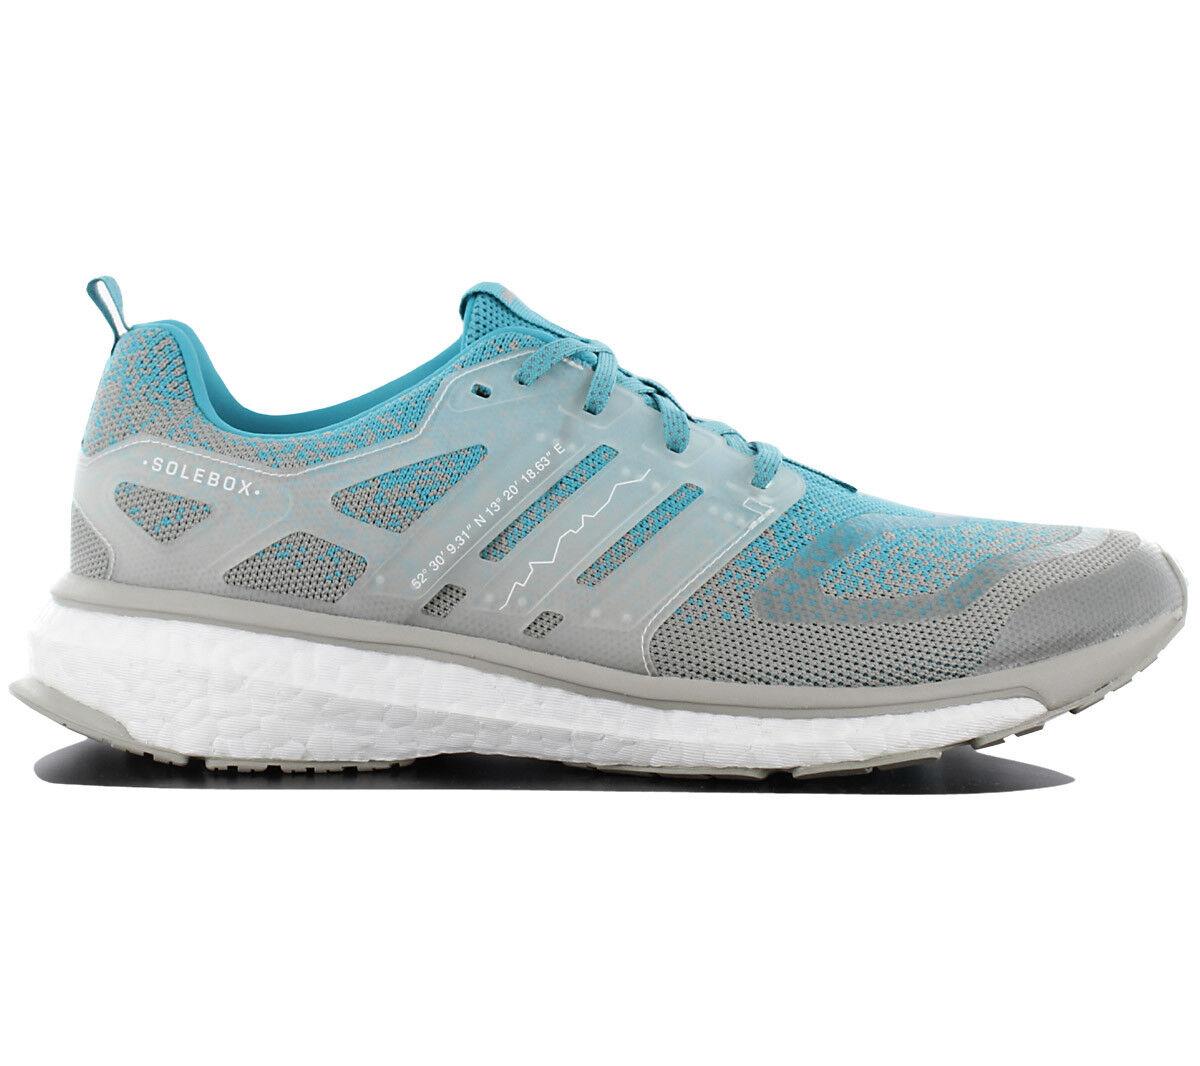 Adidas Energy Boost S.E. Packer x Solebox Herren Schuhe Turnschuhe CP9762 NEU